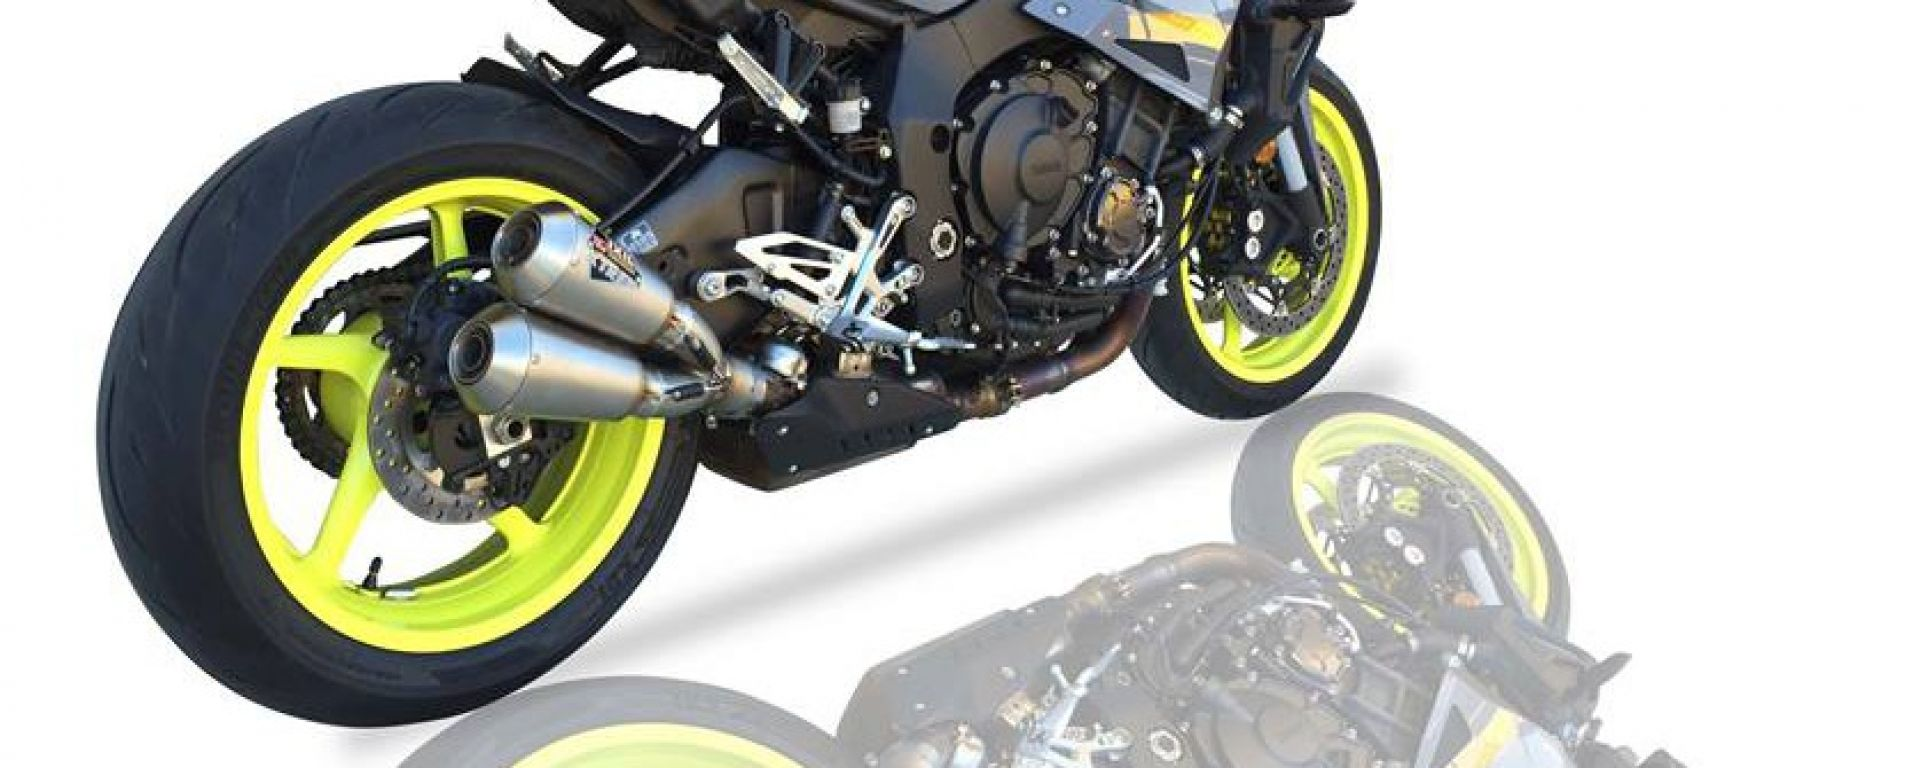 scarichi moto ixil scarico rc2 per yamaha mt 10 motorbox. Black Bedroom Furniture Sets. Home Design Ideas